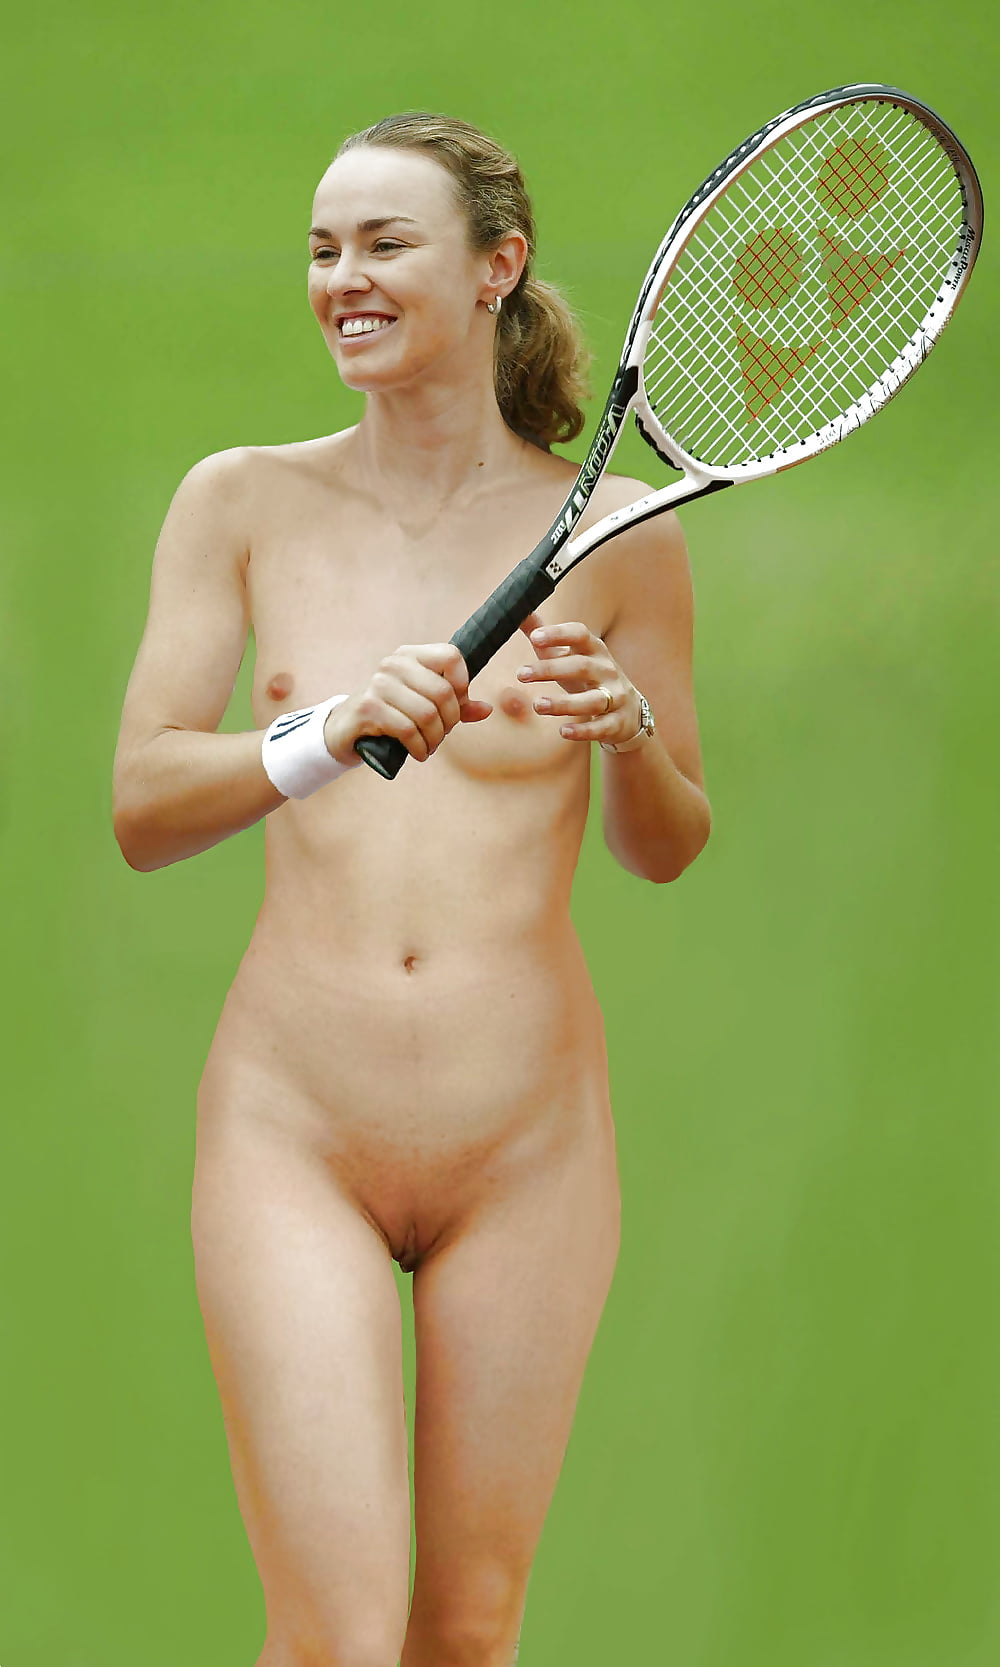 martina-hingis-topless-pictures